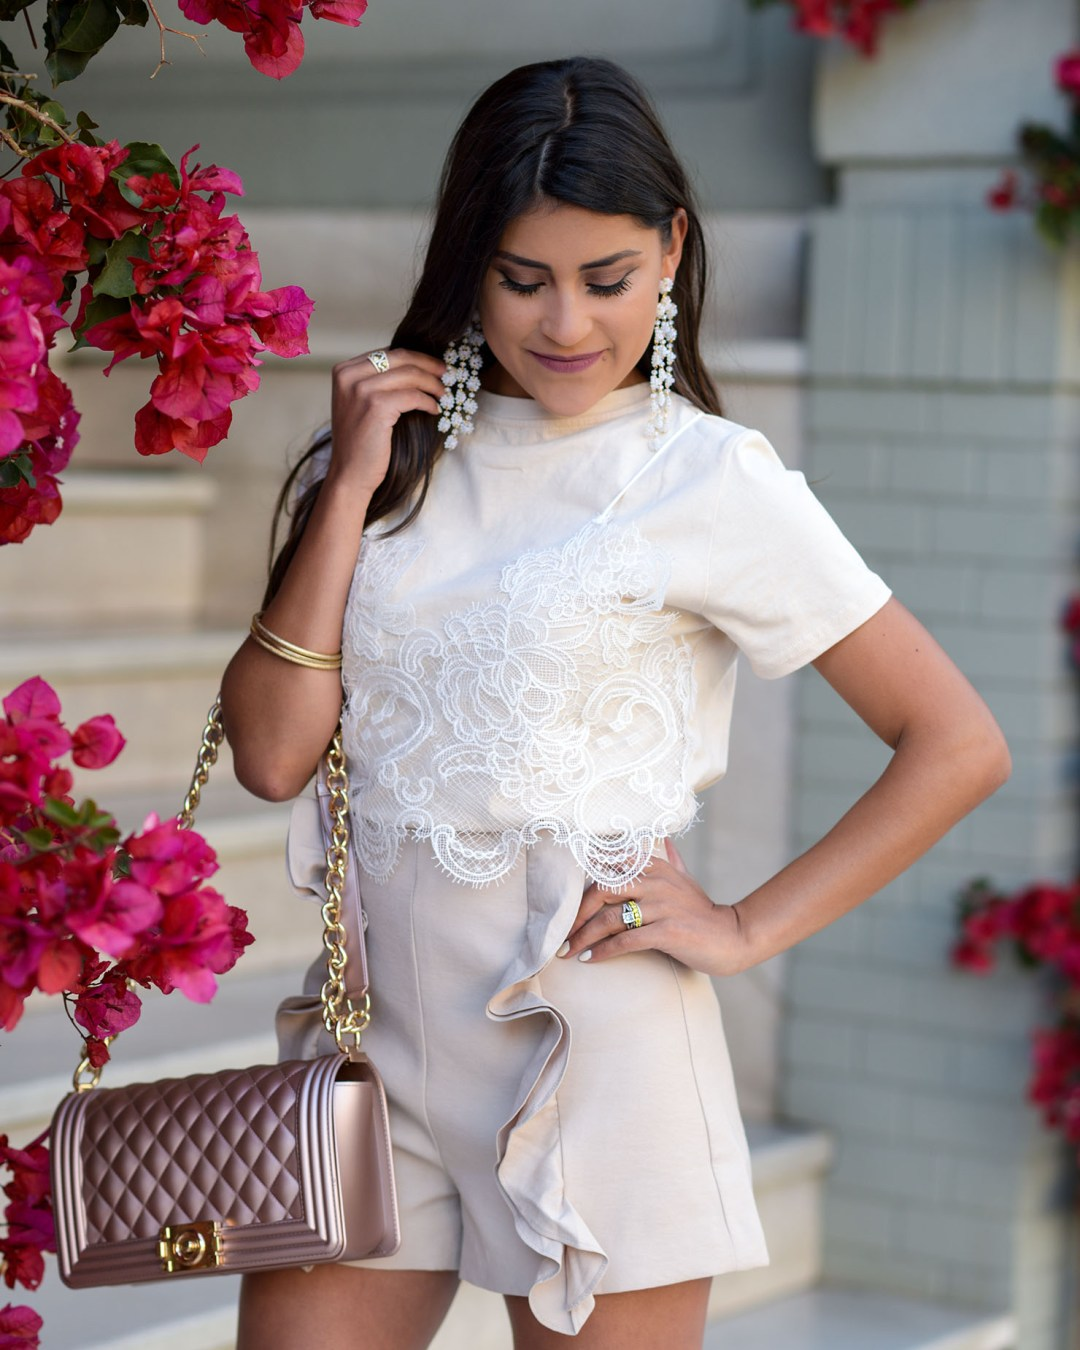 Lifestyle blogger Kelsey Kaplan of Kelsey Kaplan Fashion wearing monochrome outfit and Stuart Weitzman Rosist Sandals